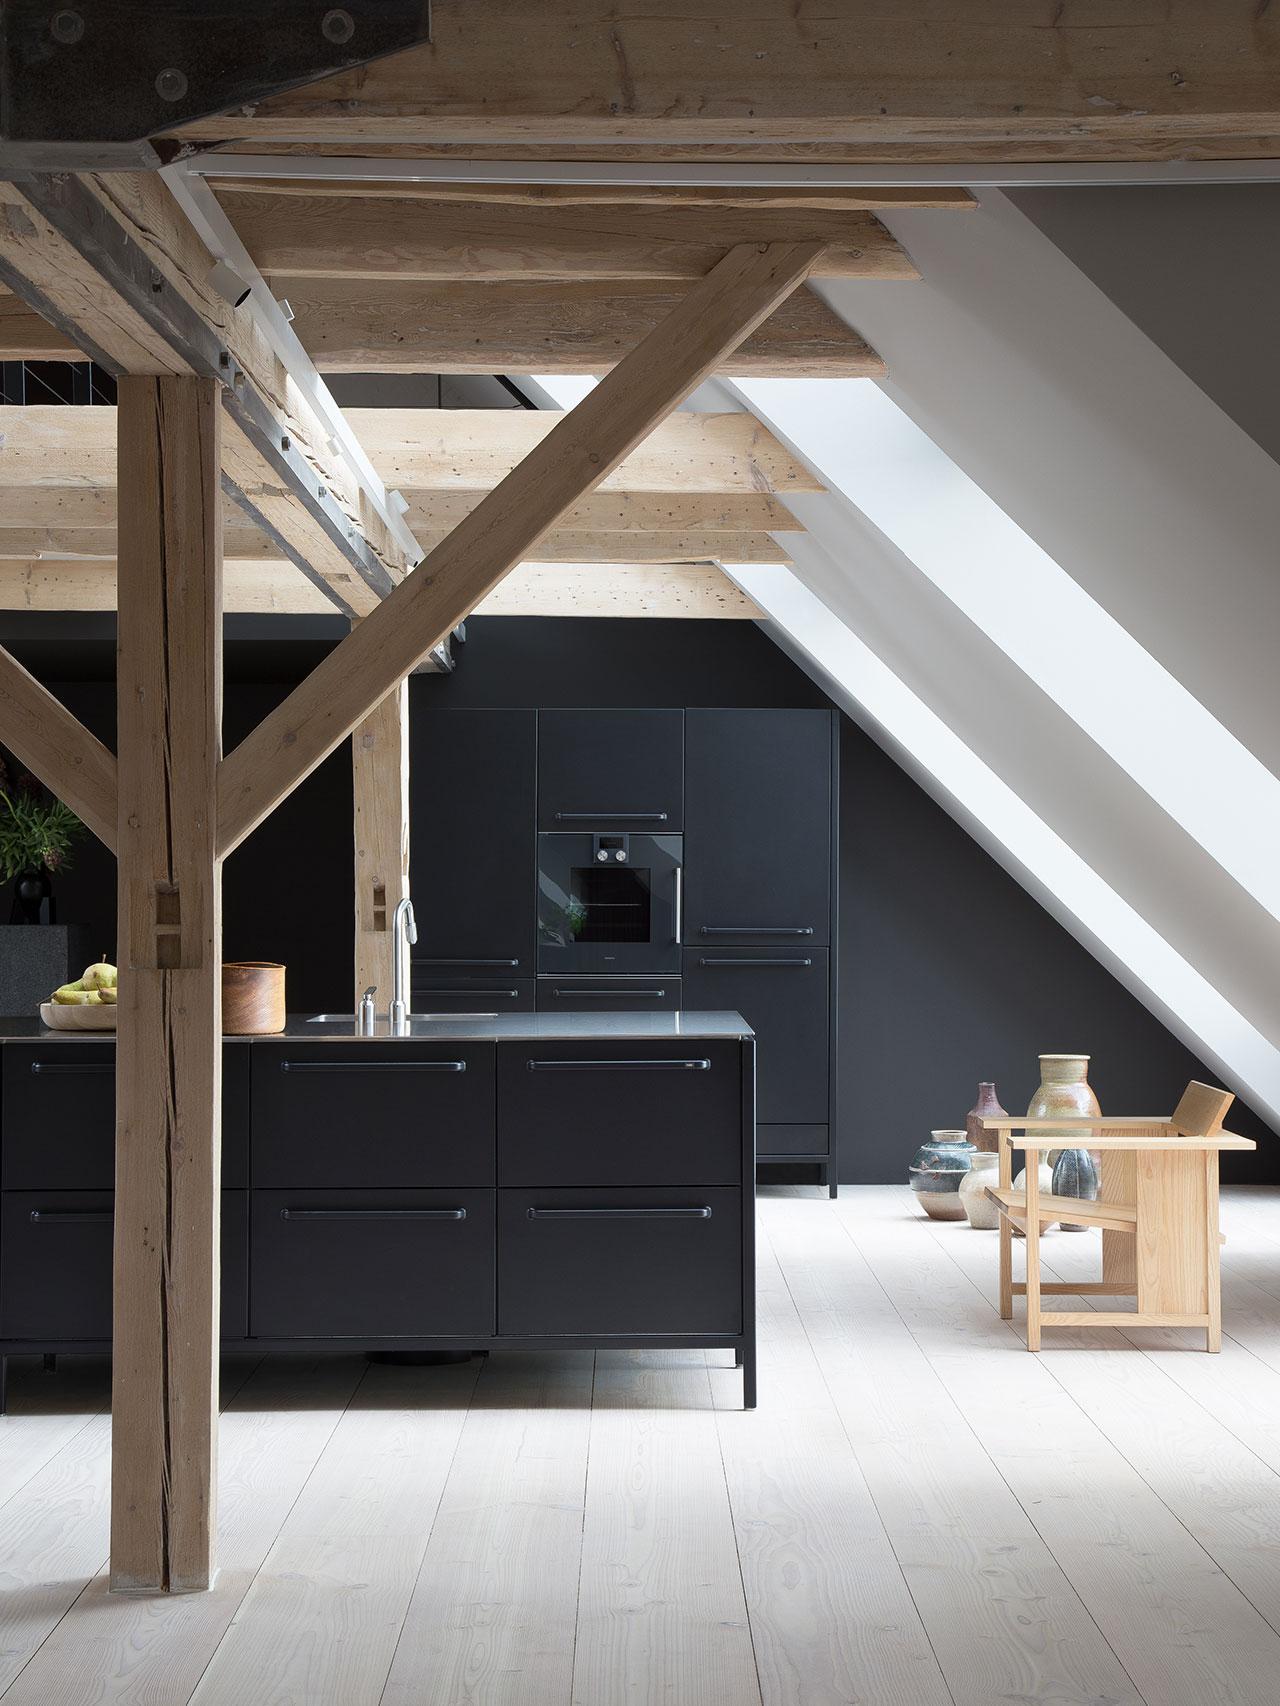 Full Size of Kche Modulküche Ikea Holz Wohnzimmer Cocoon Modulküche